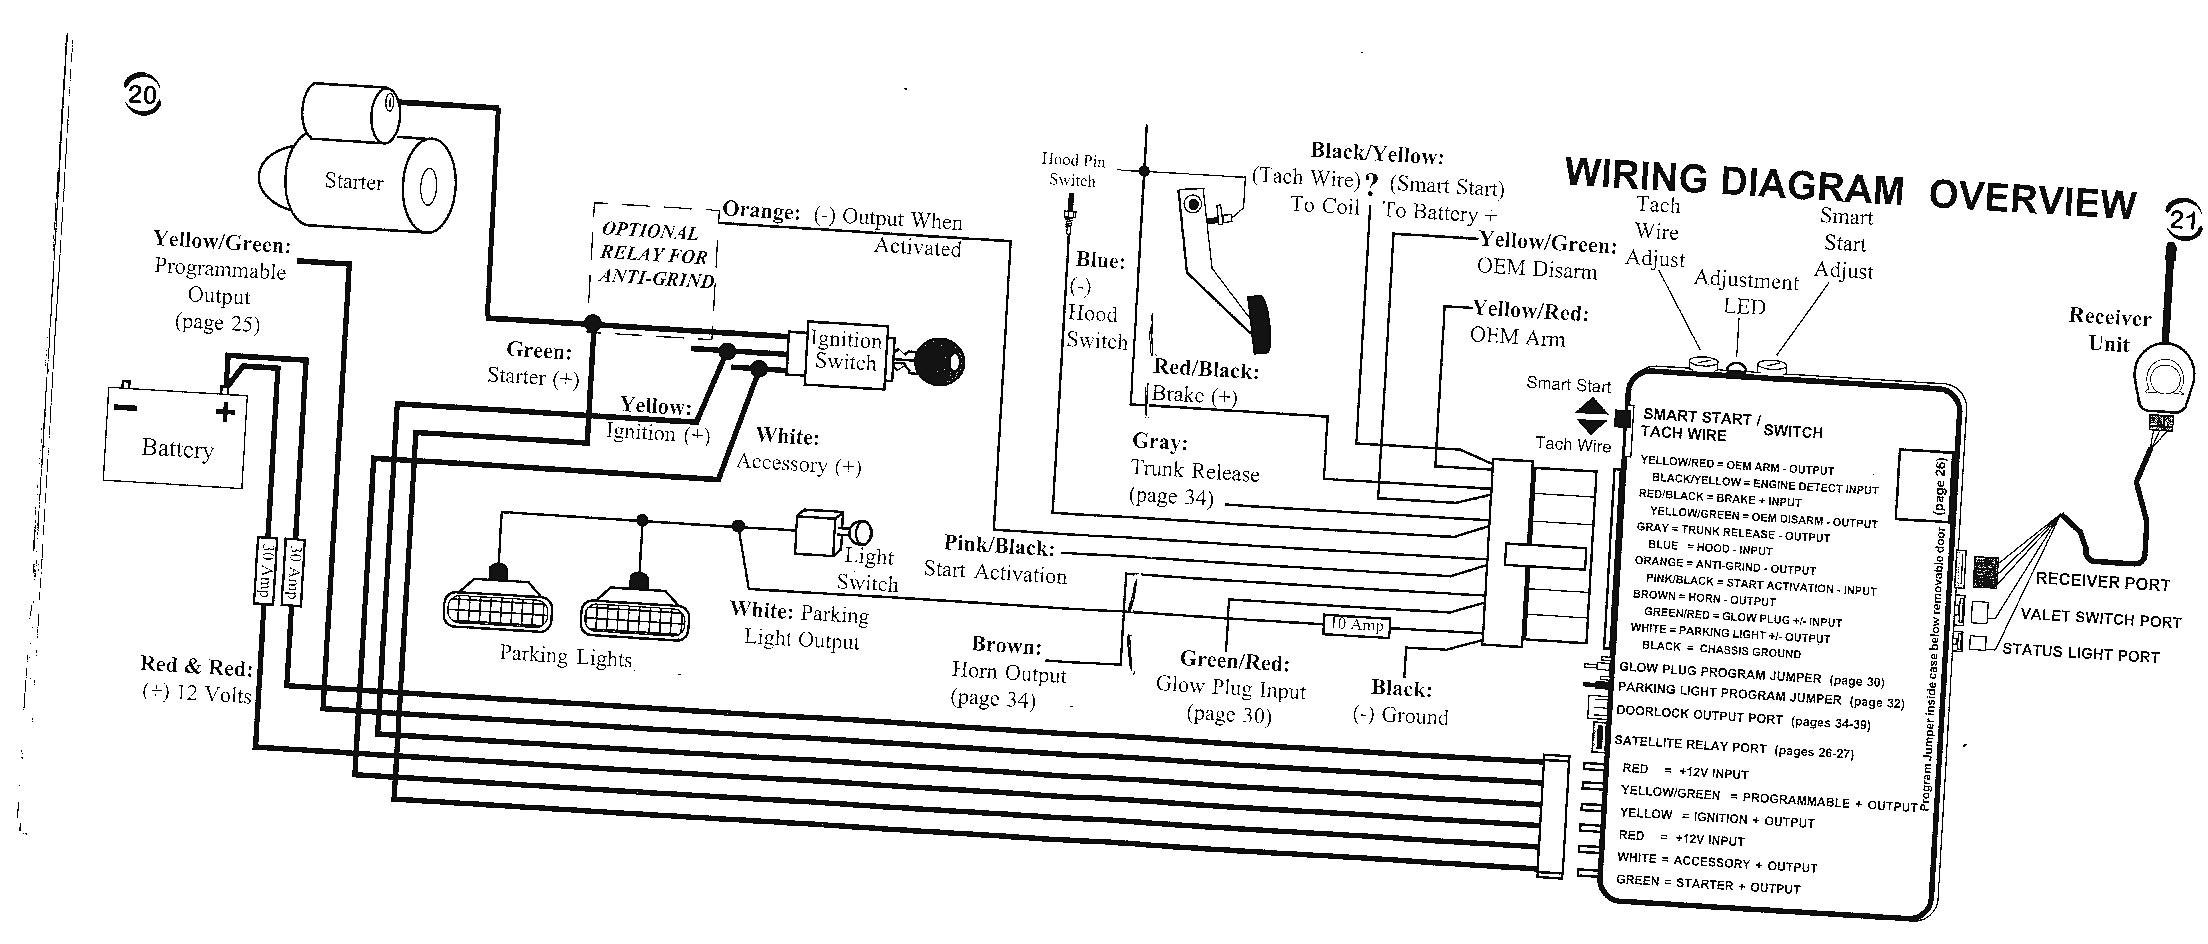 car alarm system diagram my wiring diagram rh detoxicrecenze com Viper Car Alarm Remote Replacement Viper Car Alarm Remote Replacement